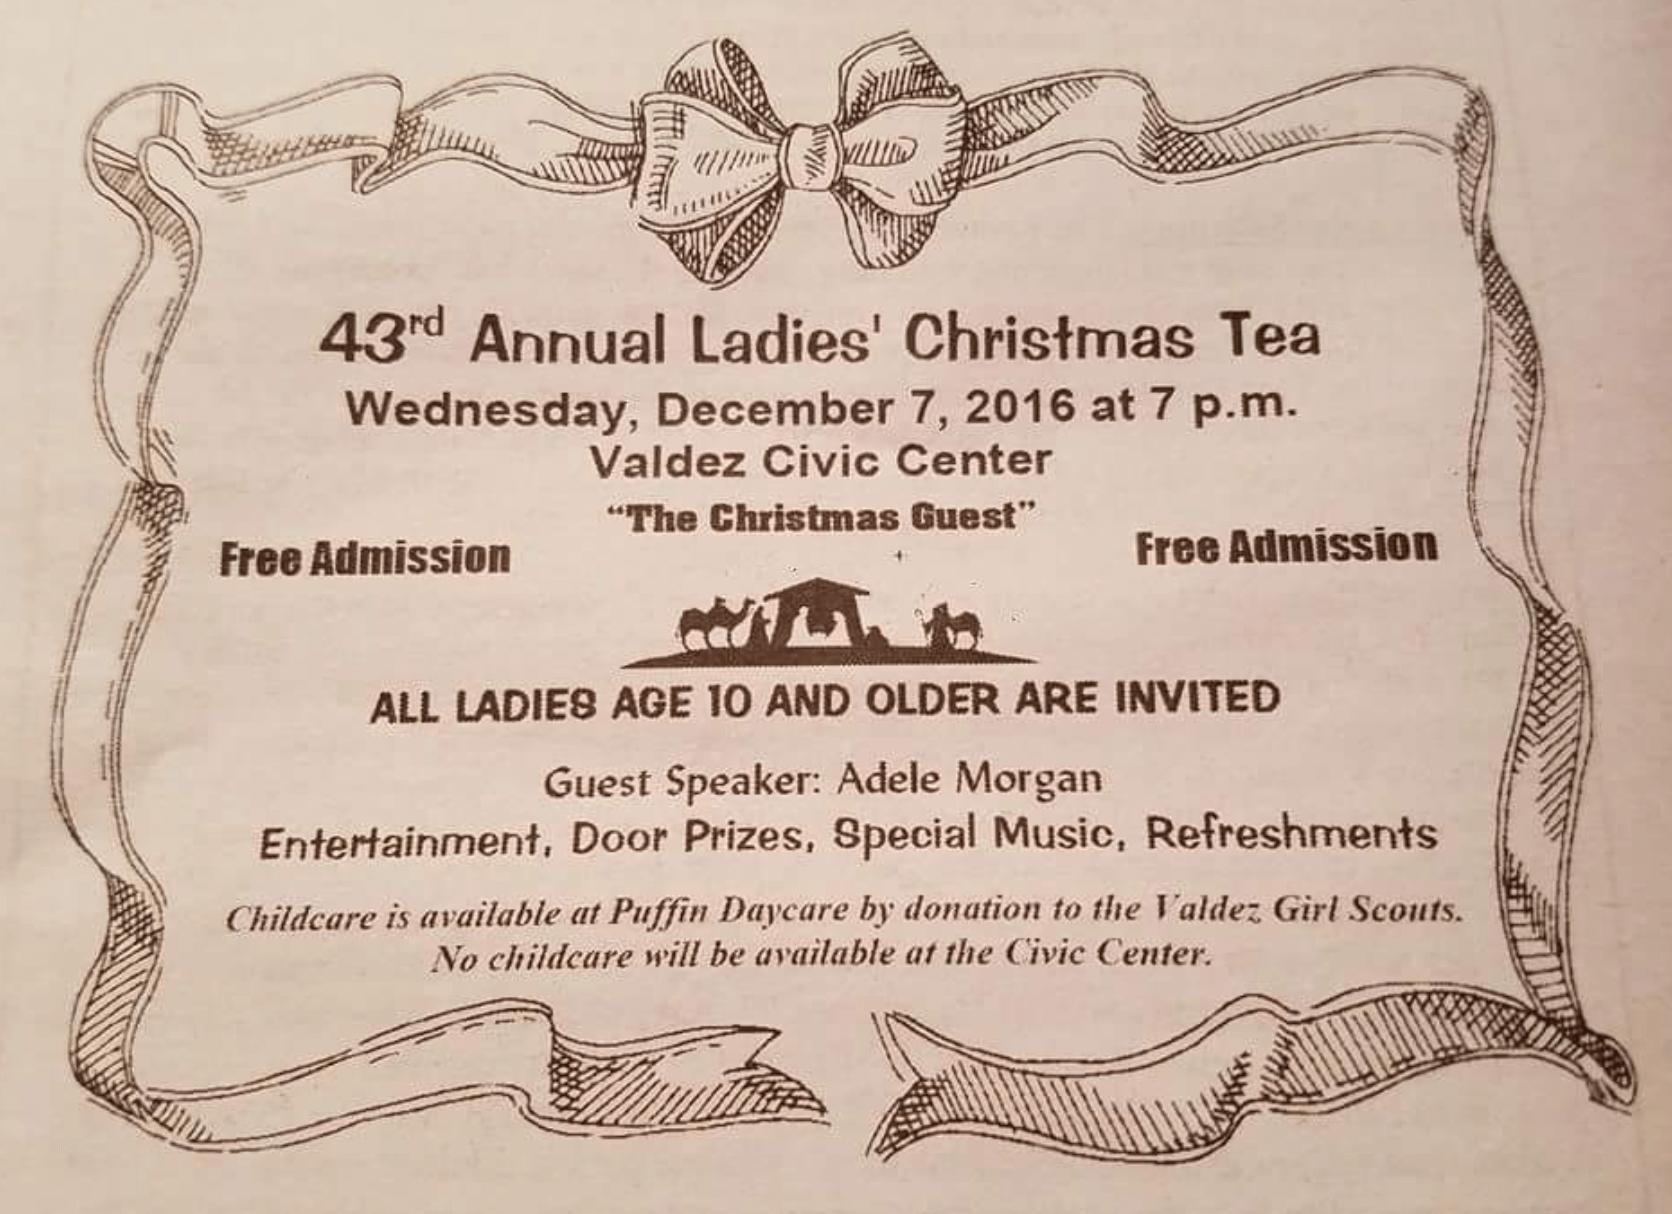 Ladies' Christmas Tea Flyer